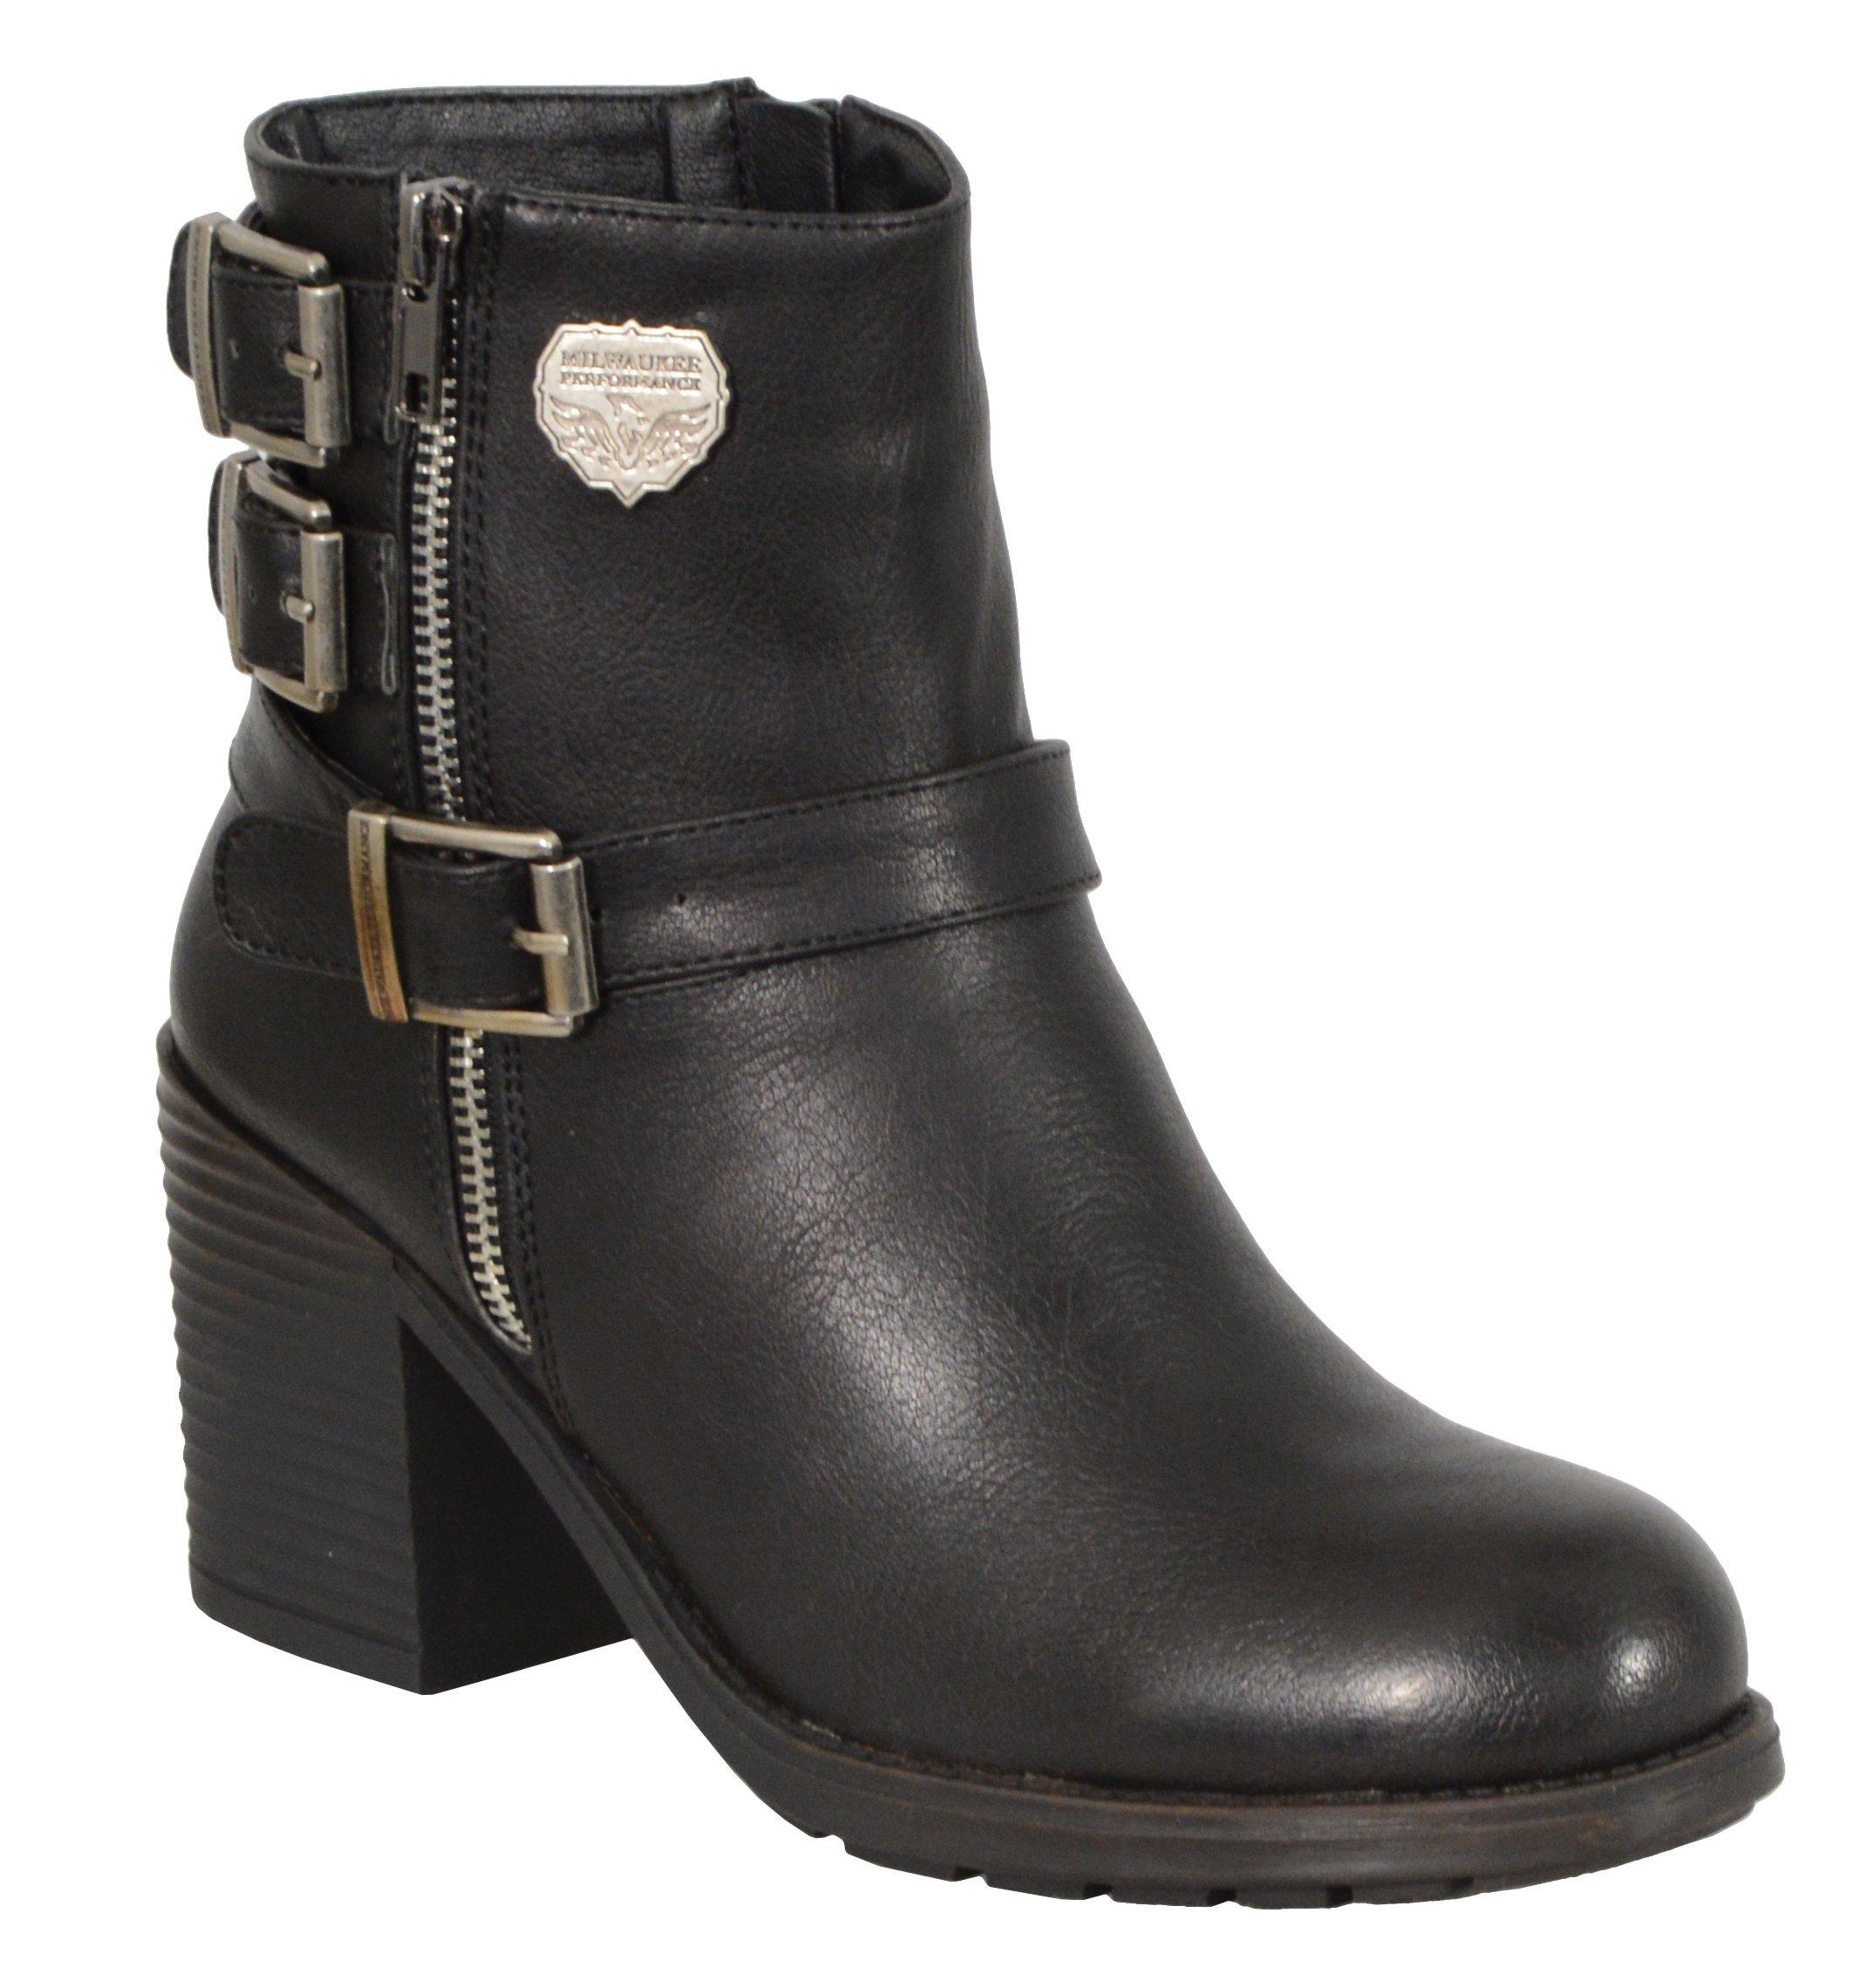 Milwaukee Performance Women's Triple Buckle Side Zip Boots with Platform Heel (Black, Size 9)